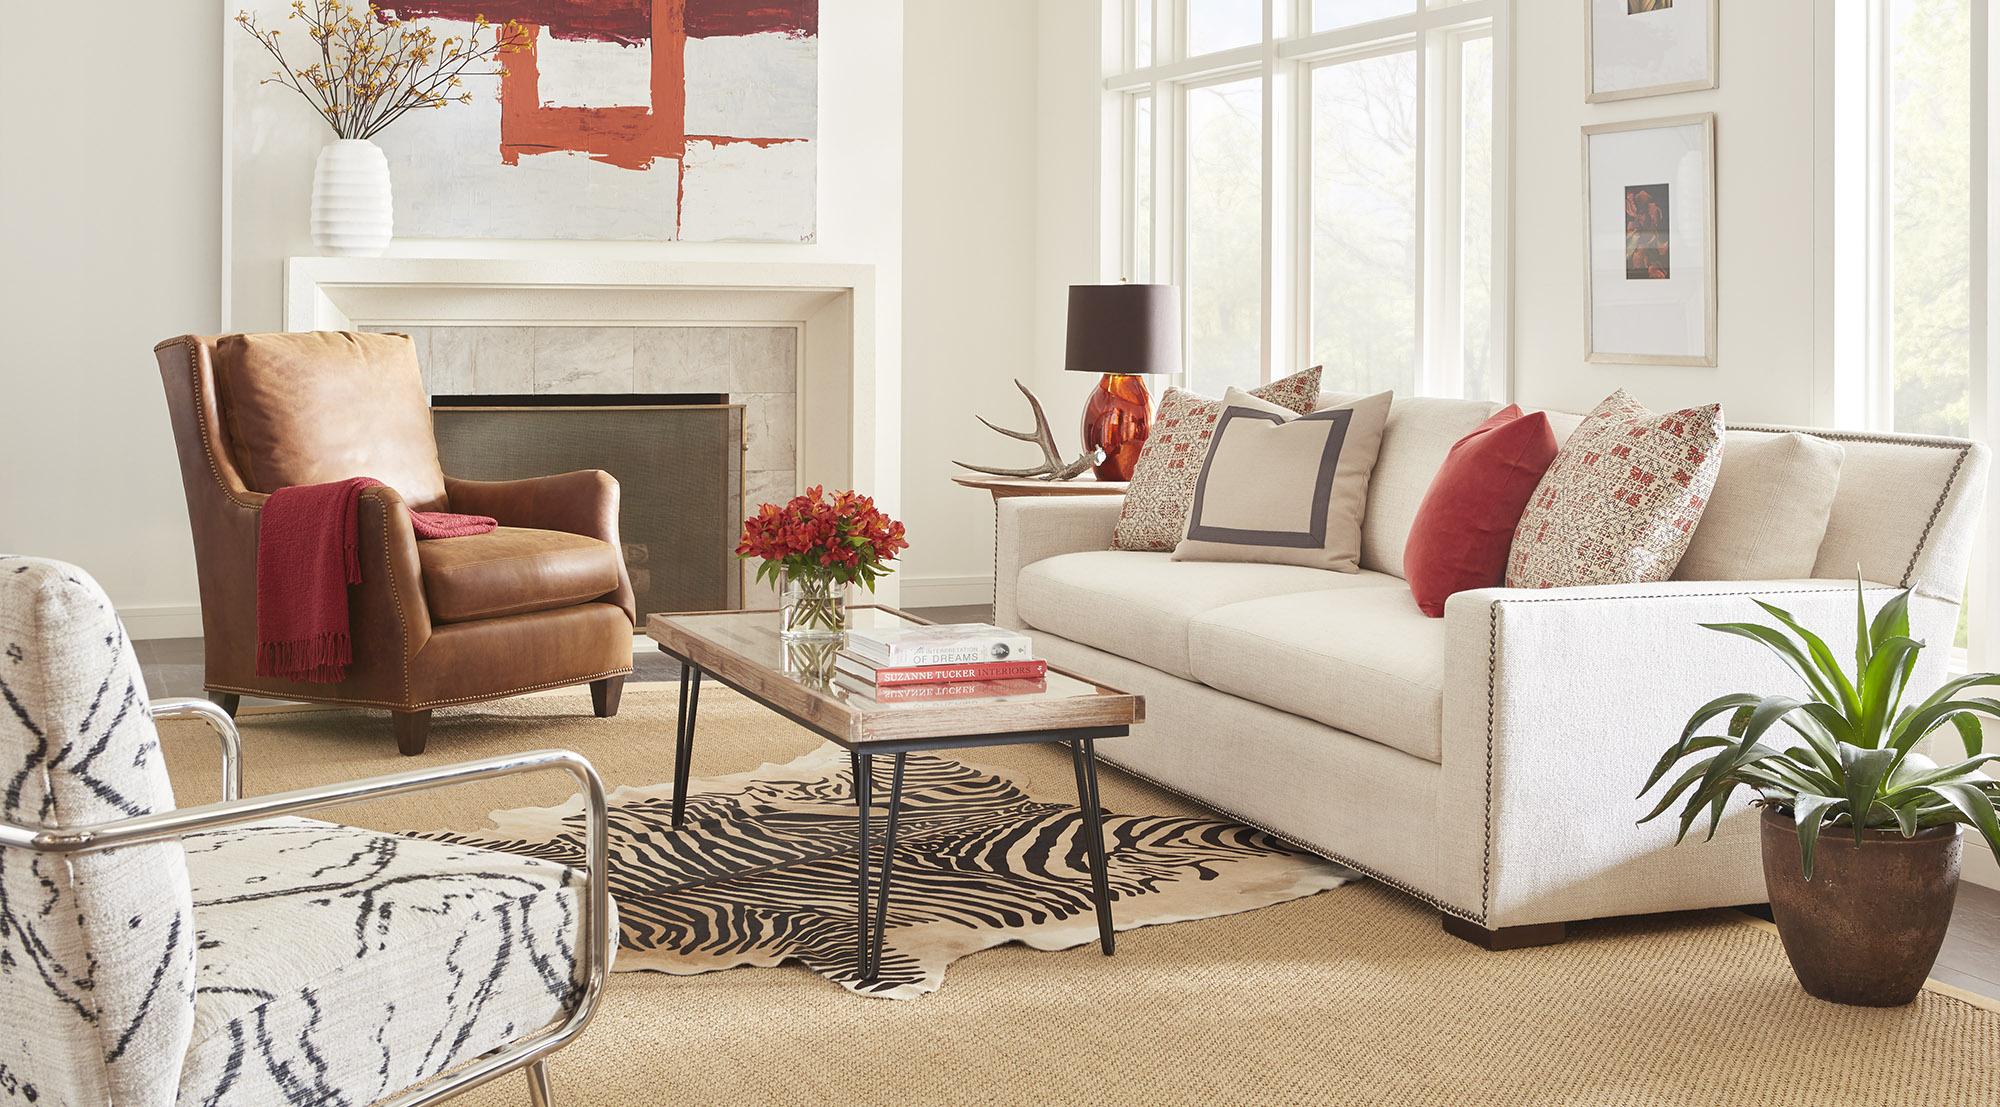 Livingston Furniture Tampa Fine Furniture Massoud Furniture At